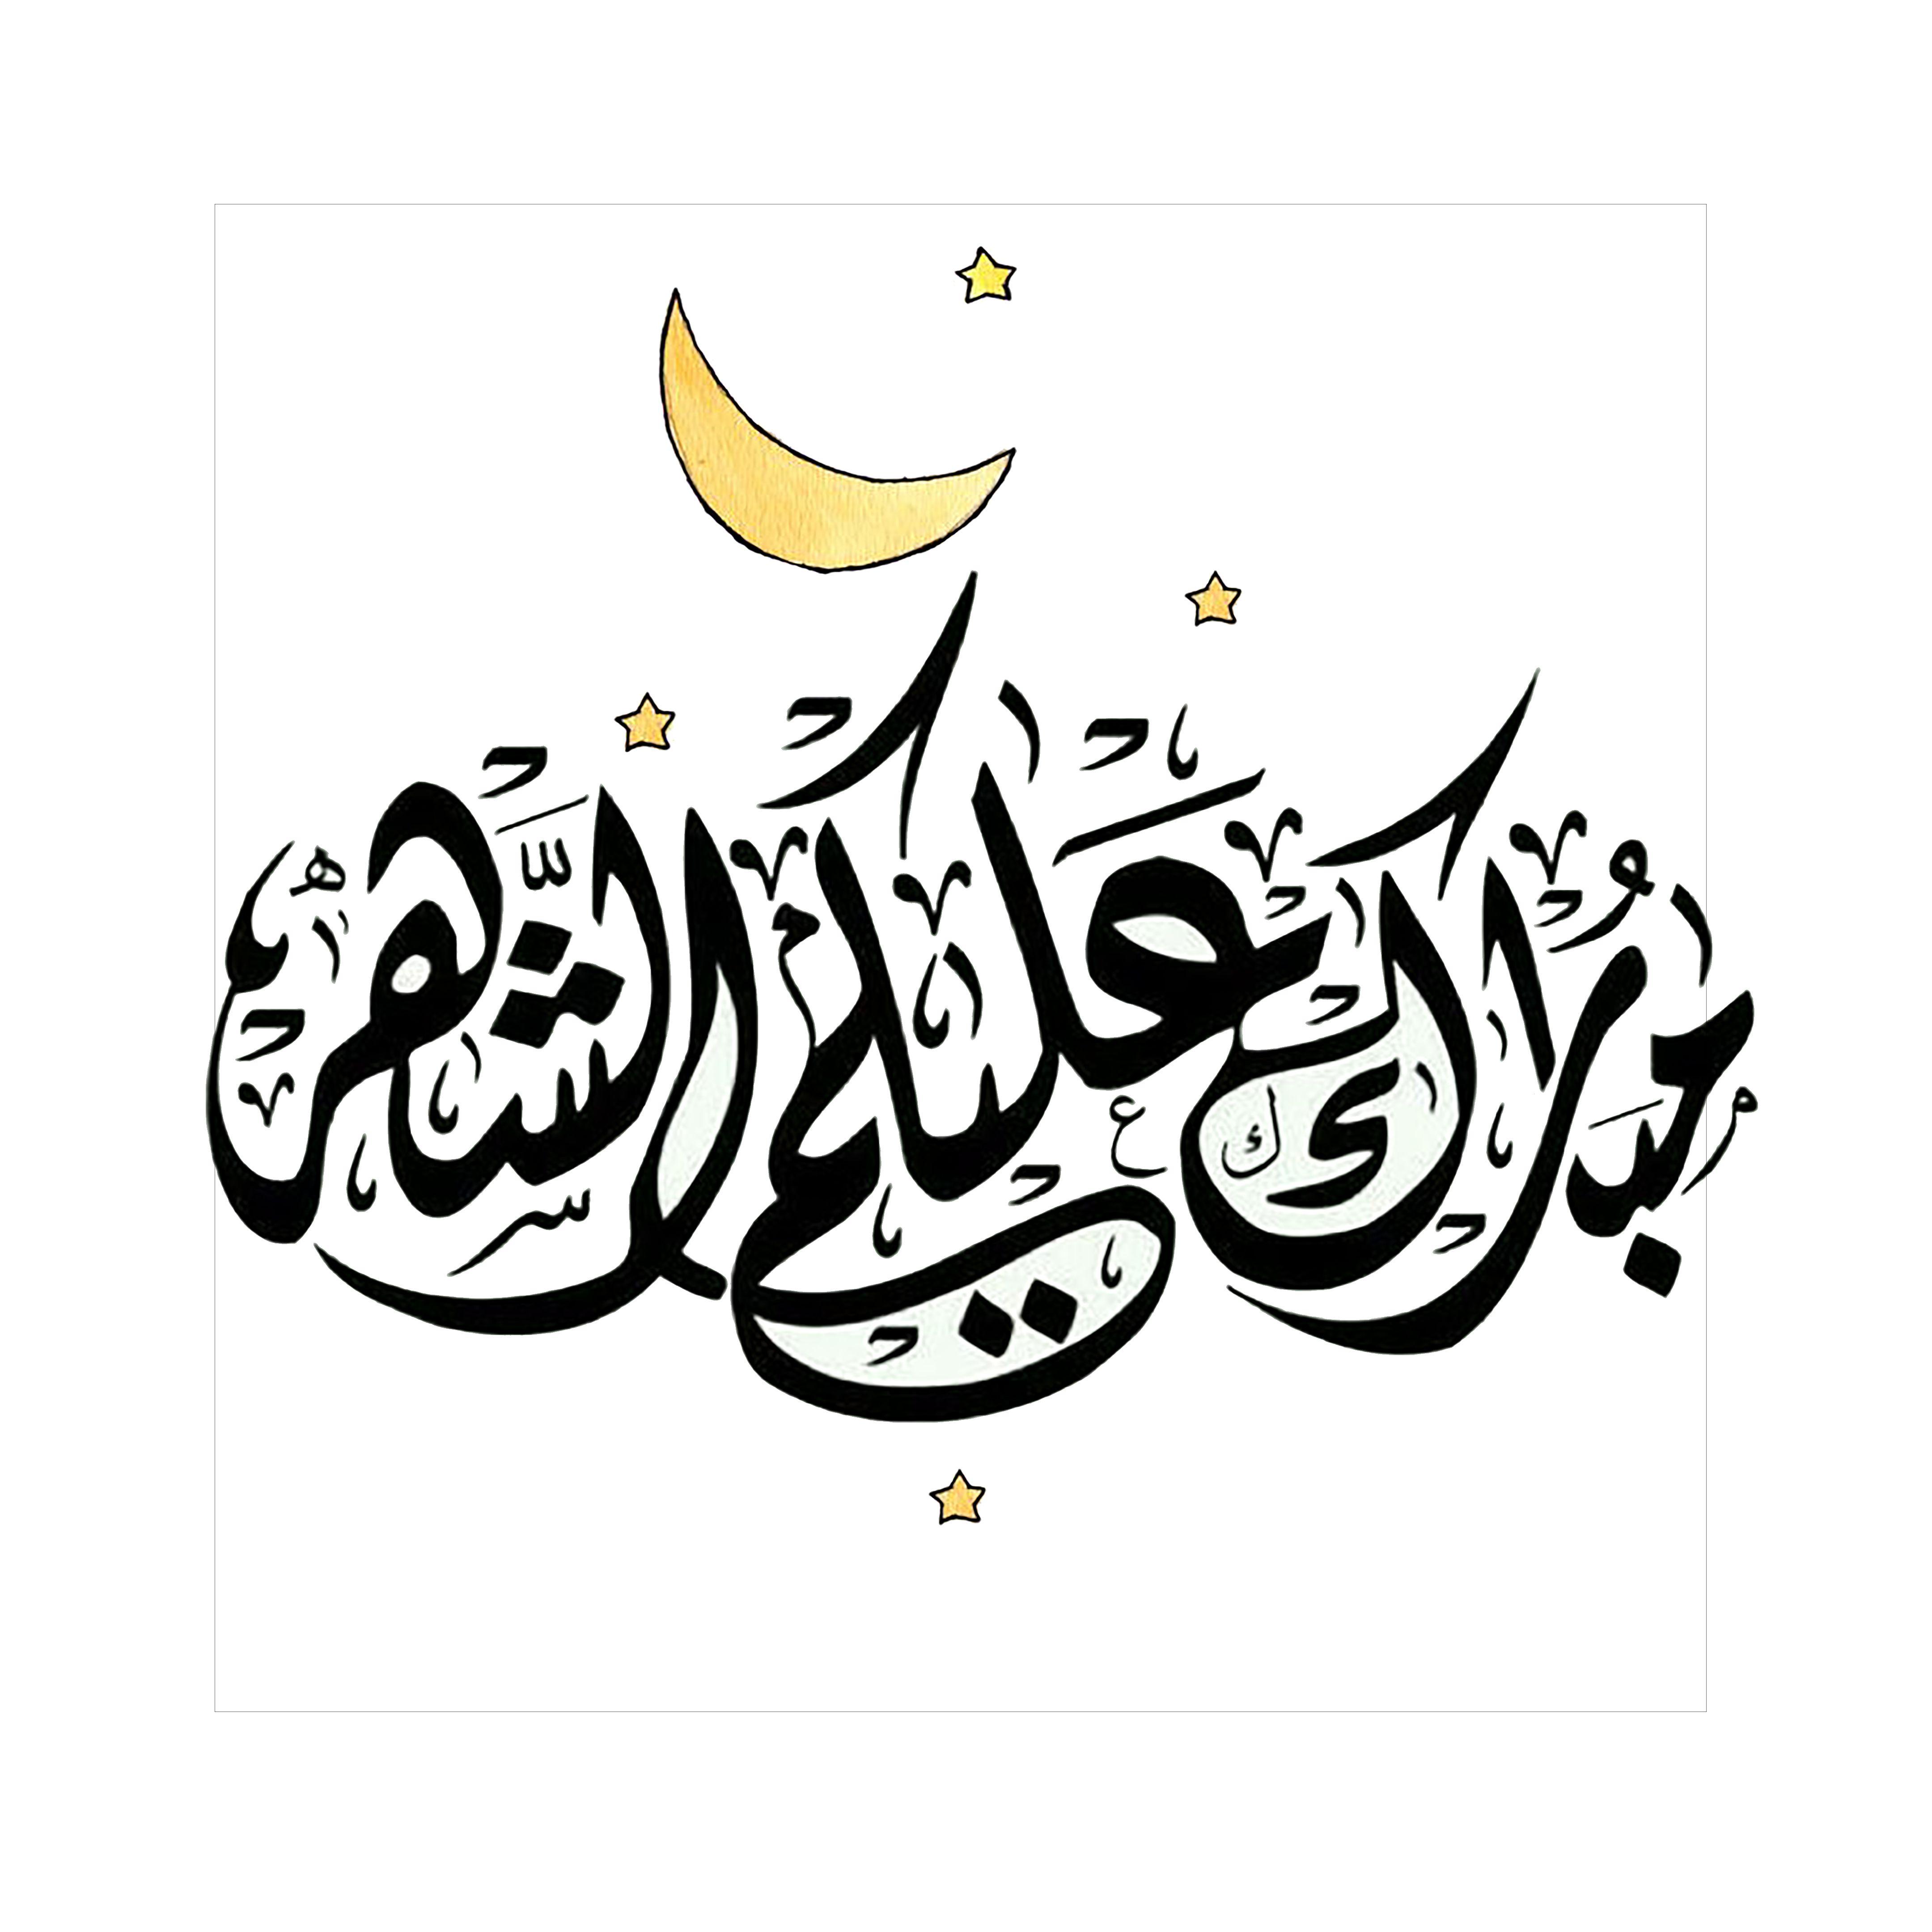 Pin By Sumu On رمضان Ramadan Cards Ramadan Greetings Ramadan Images